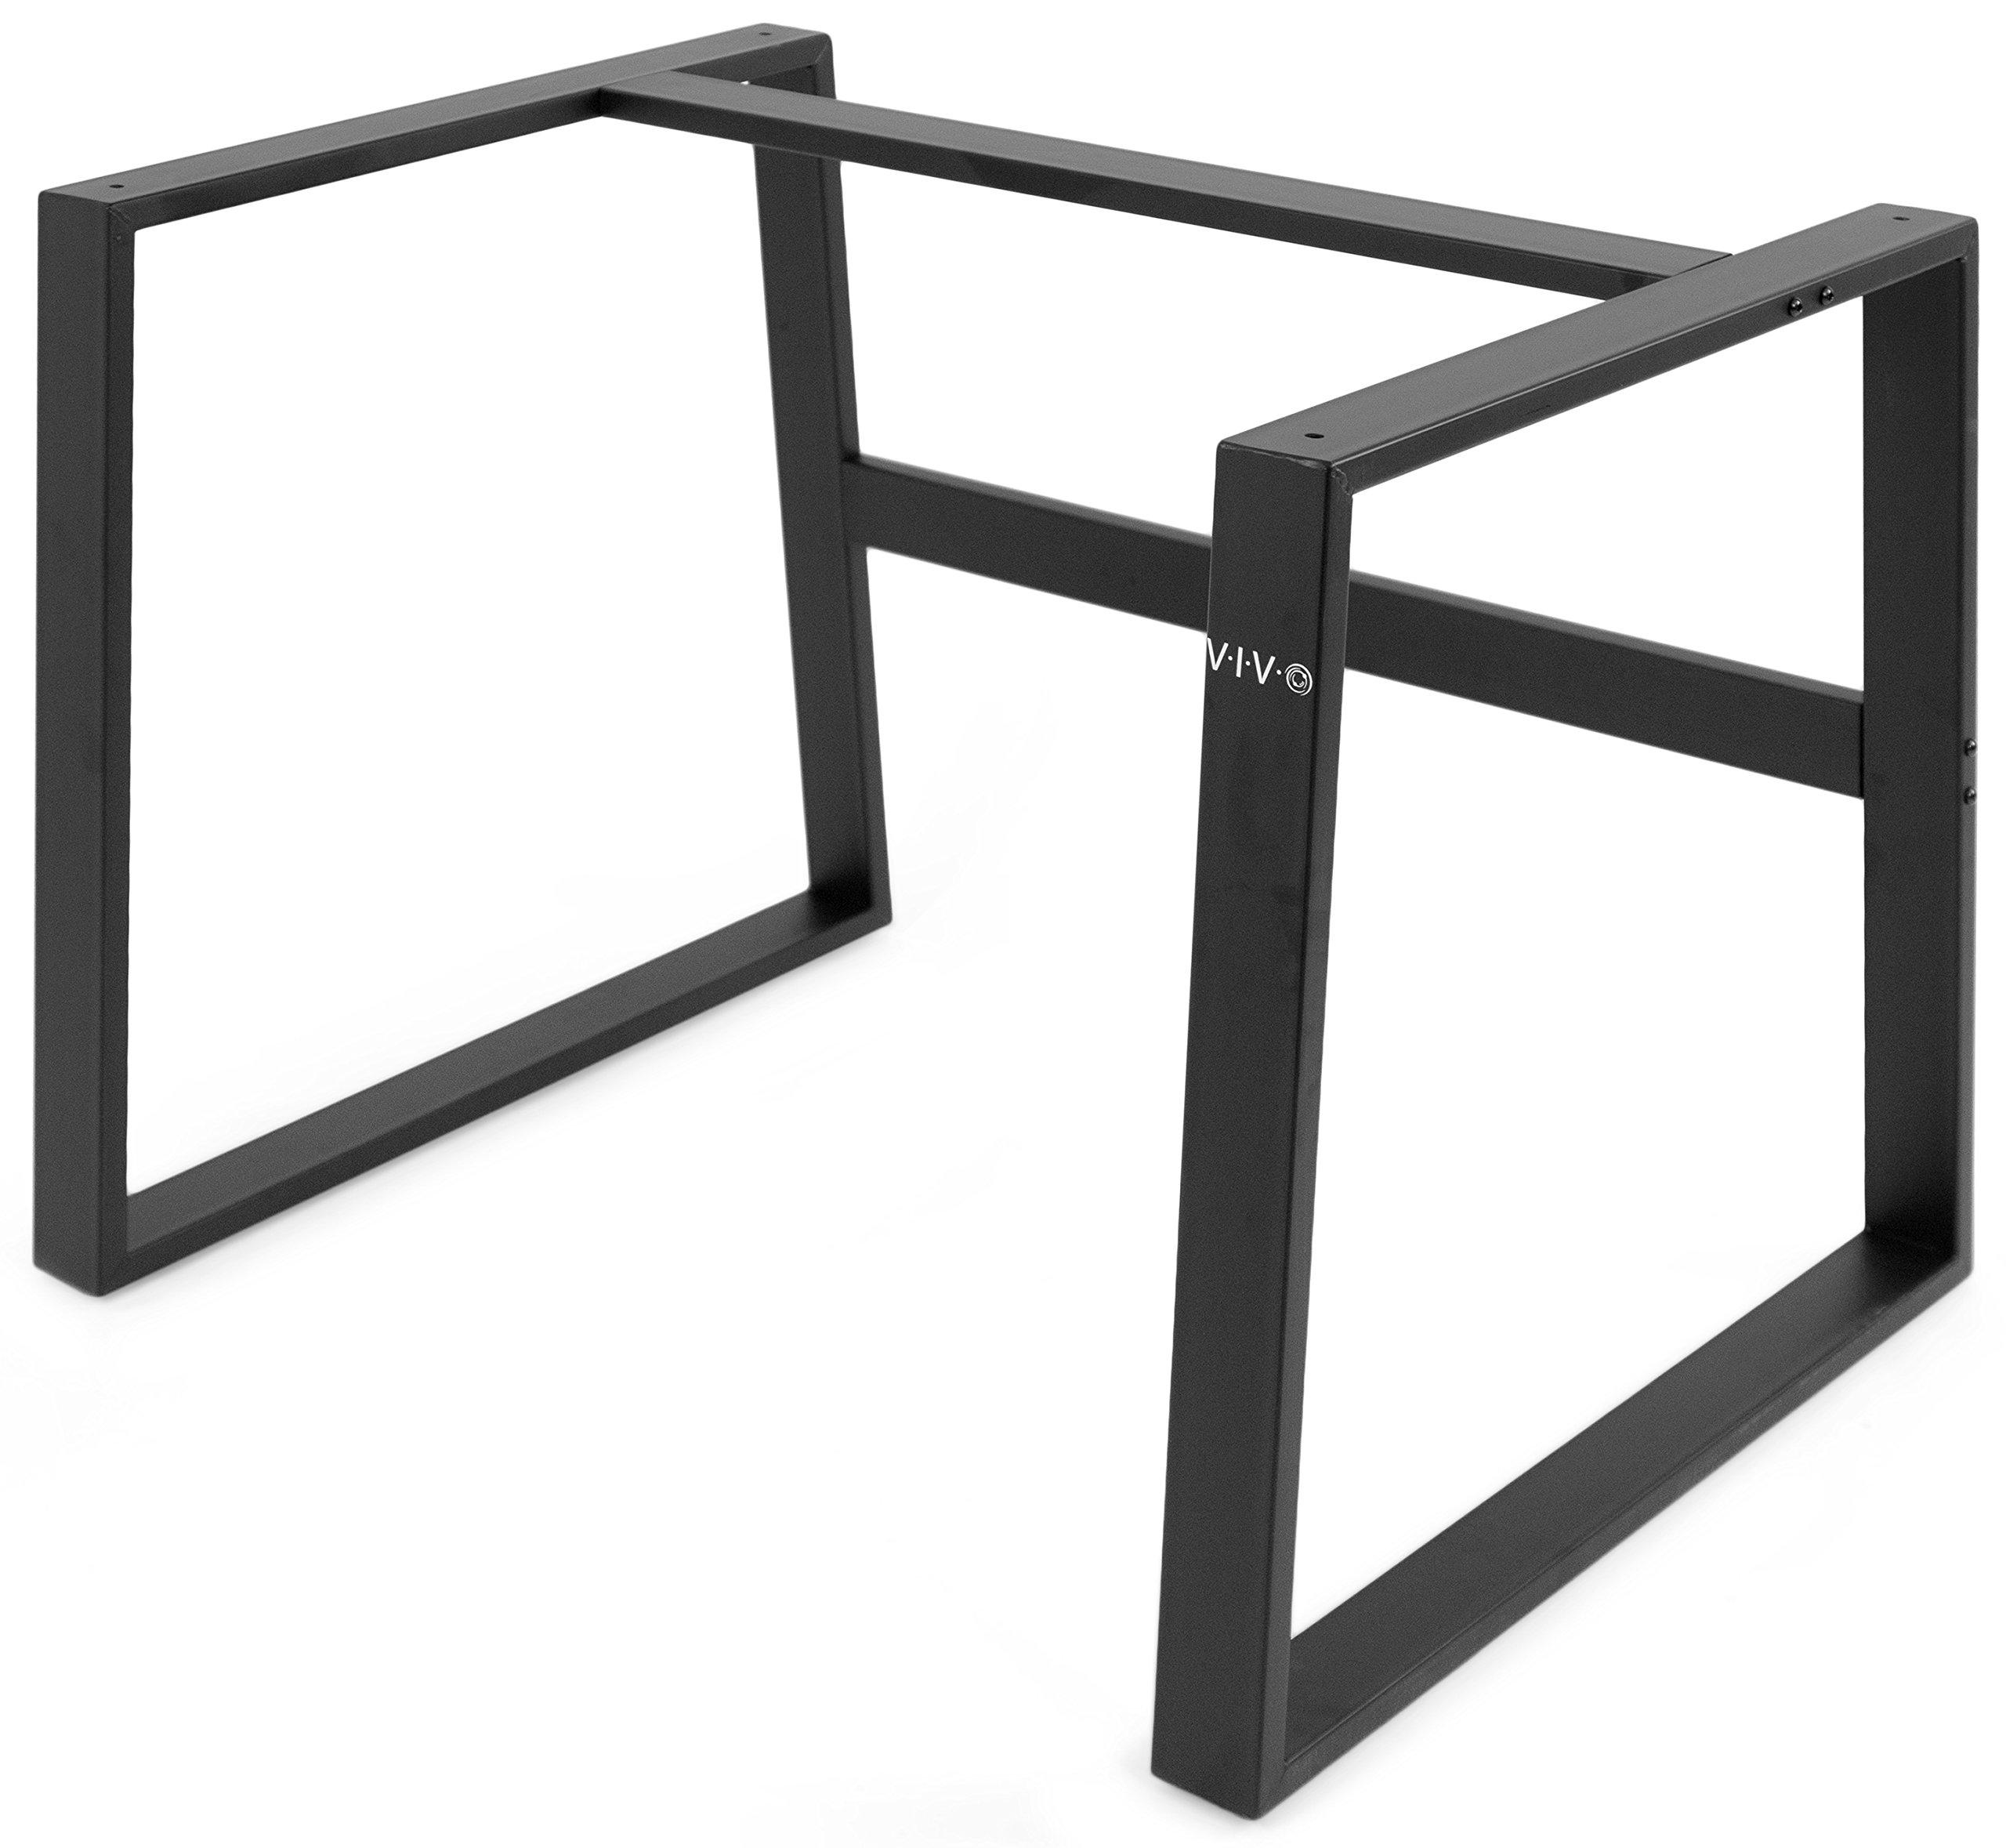 VIVO Black Heavy-Duty Desktop Monitor Riser Frame | Desk Base Legs for Height Adjustable Sit to Stand Tabletop Workstation Converter (DESK-LEGS7)